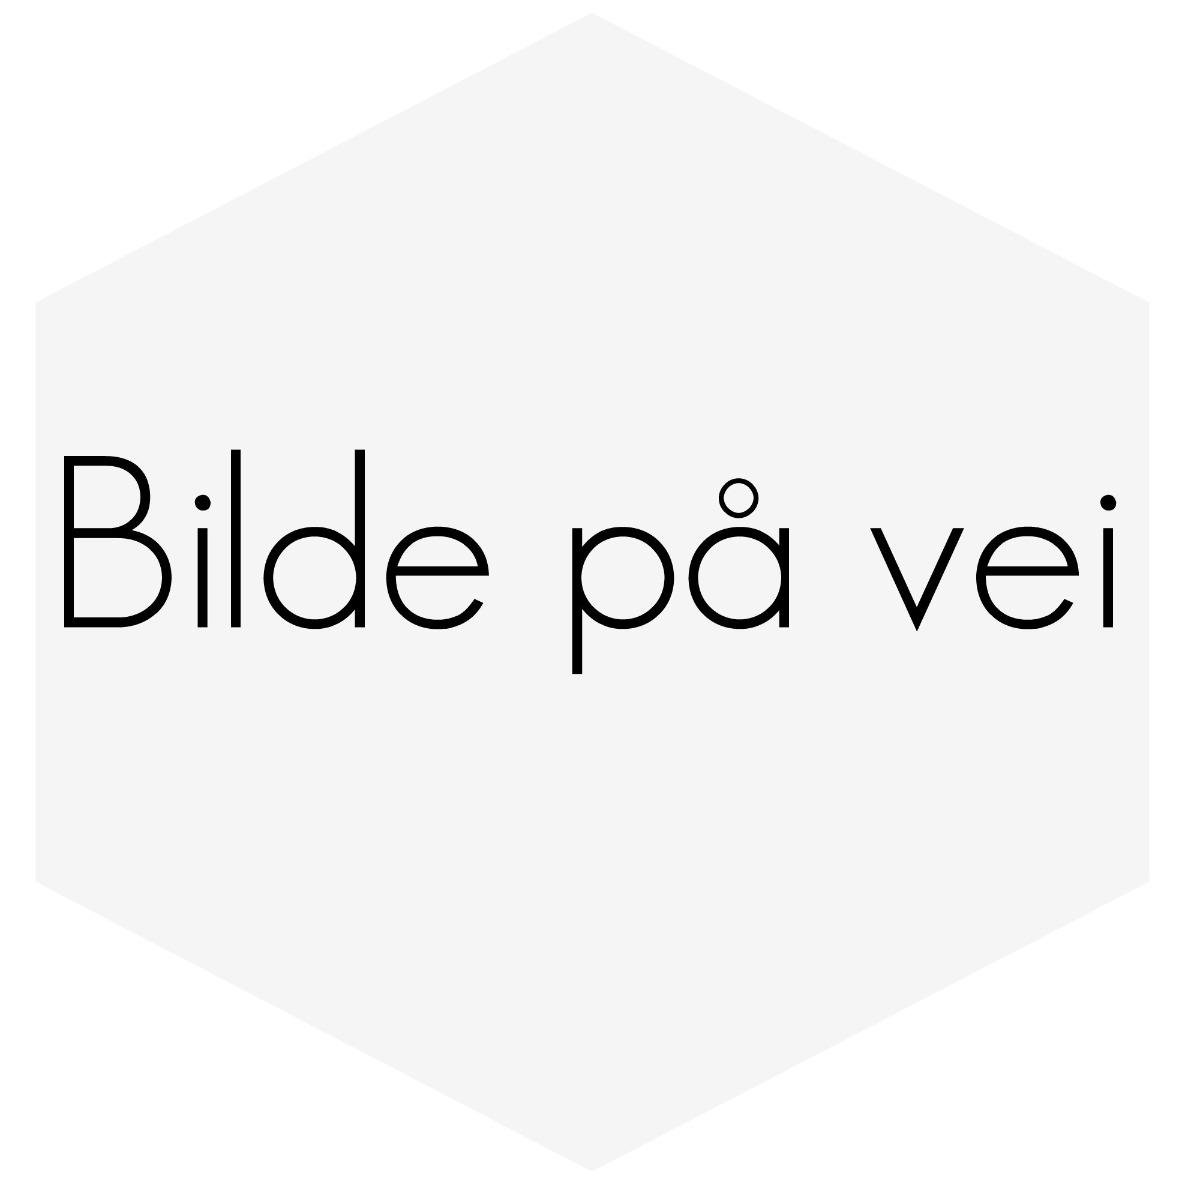 STØTDEMPER FORAN HØYRE SIDE VOLVO 400 SERIEN